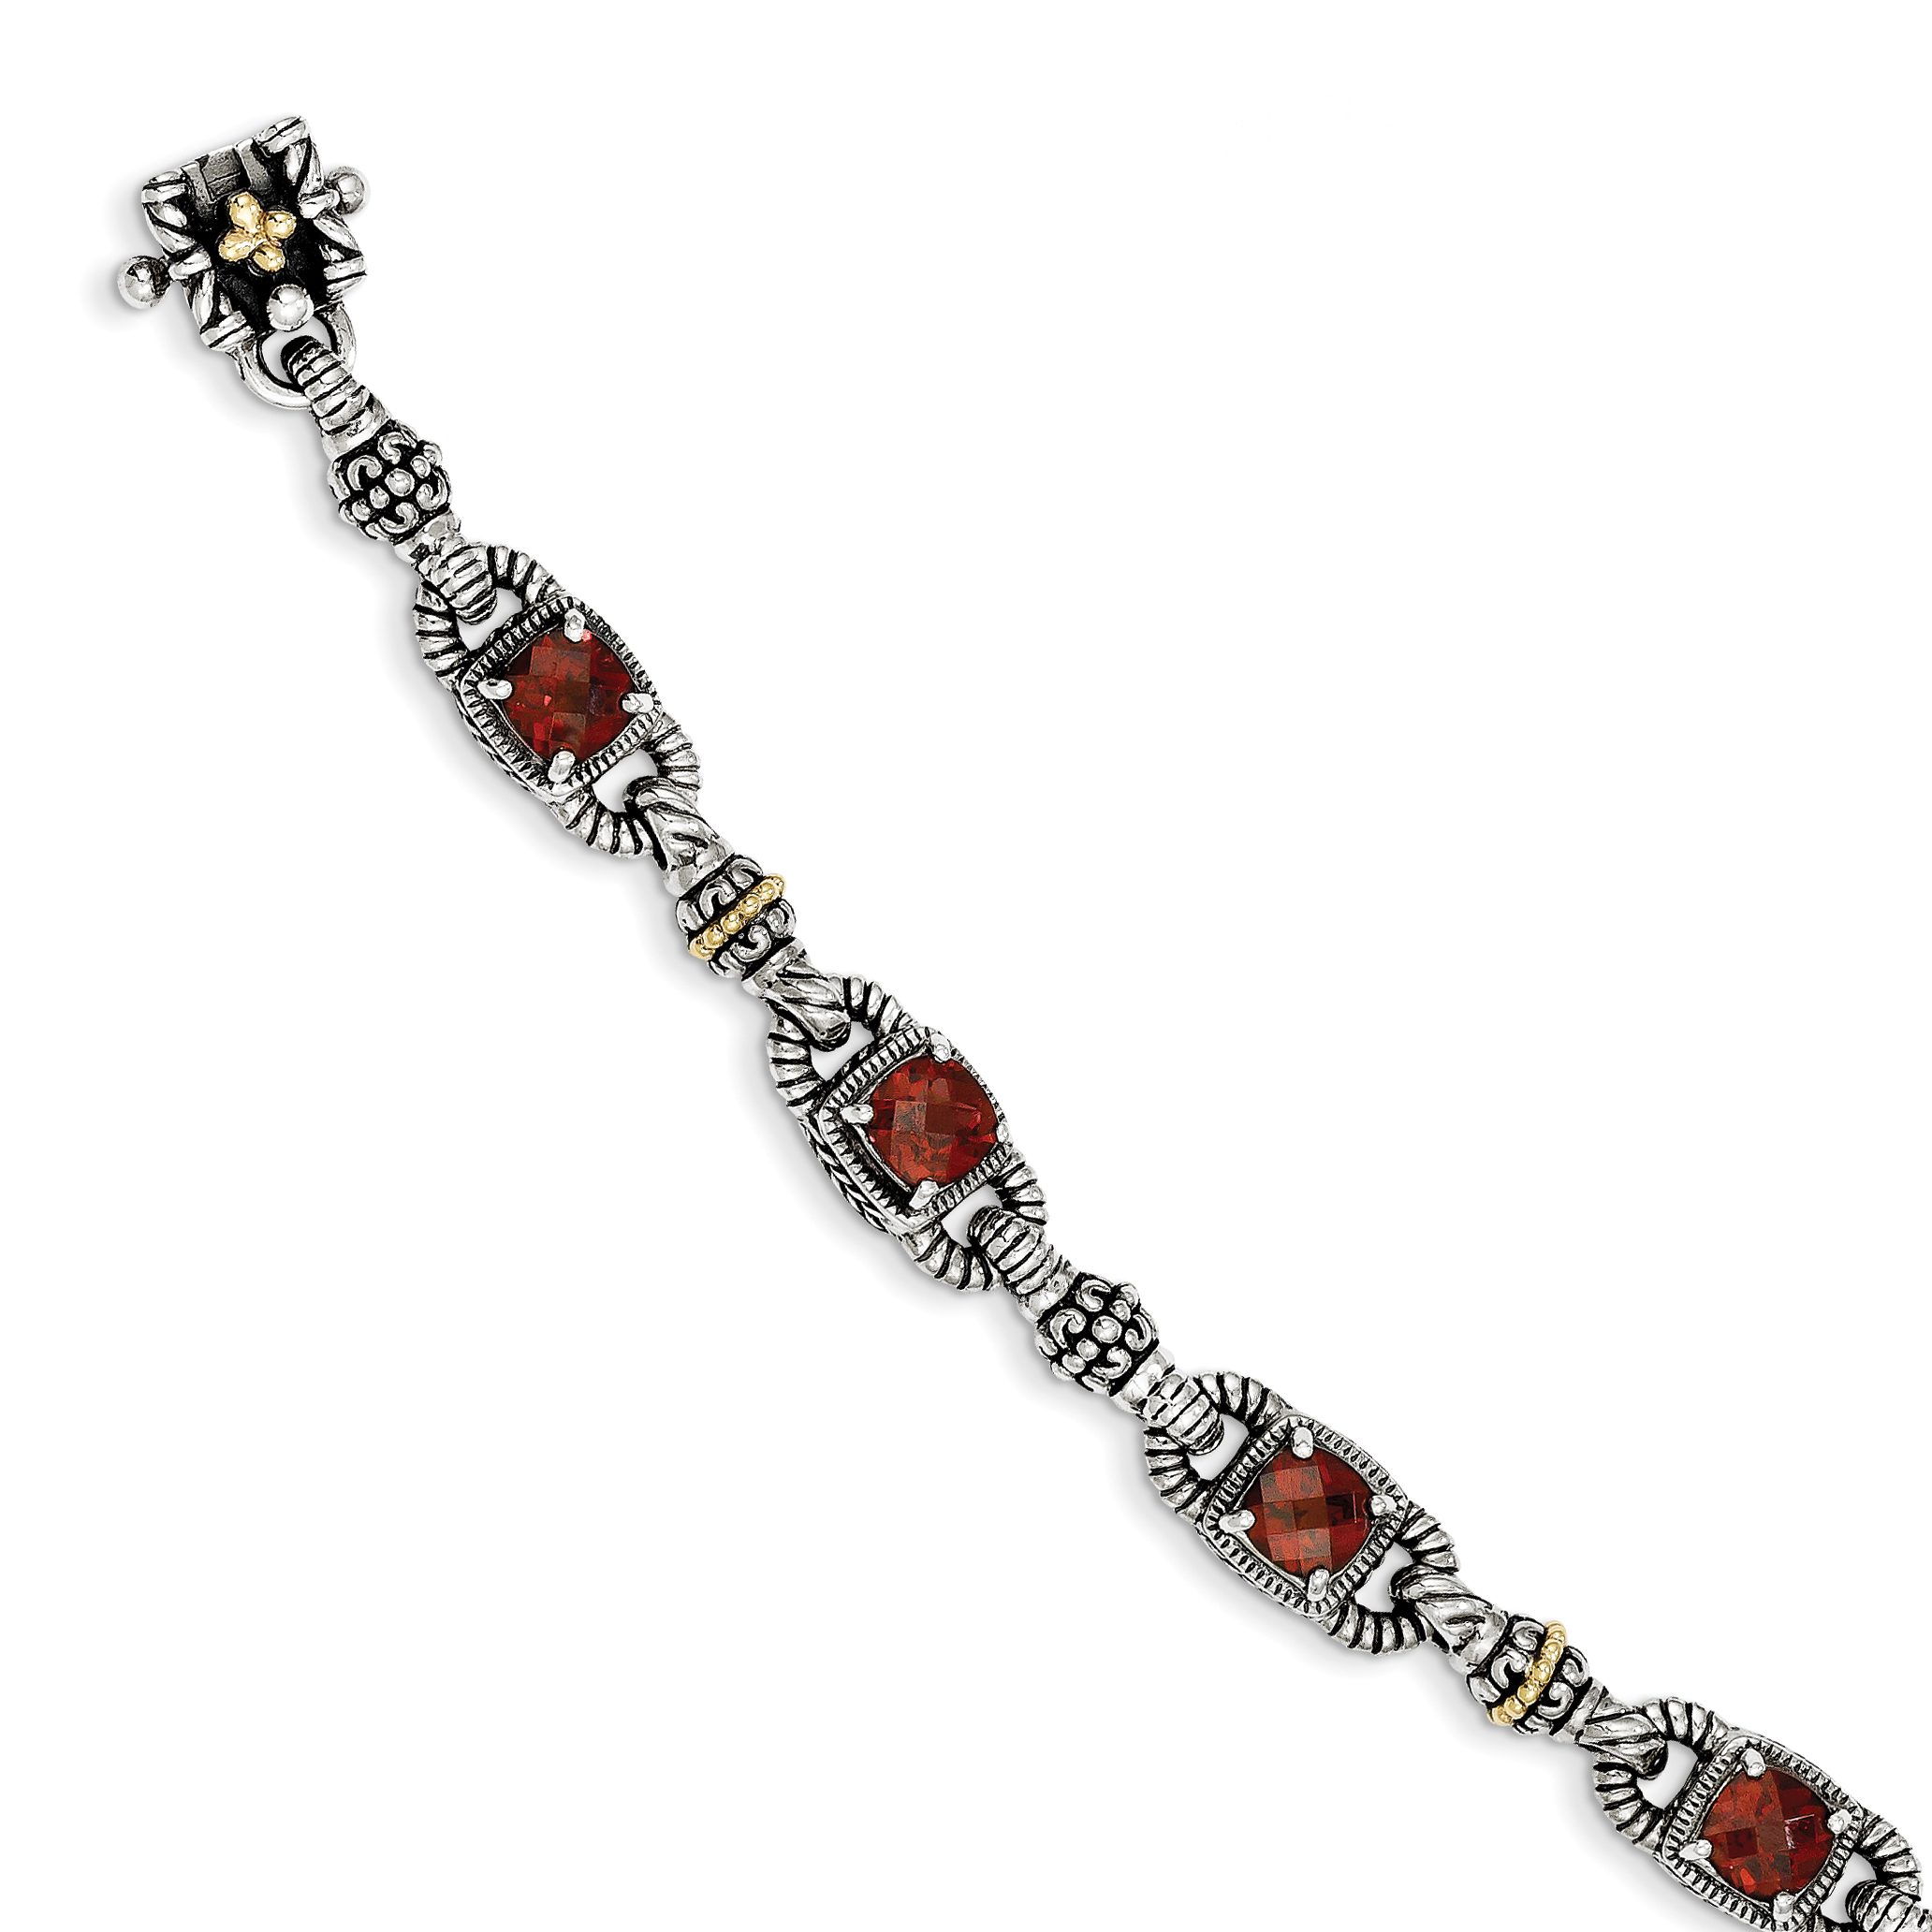 Sterling Silver w 14k Cushion-cut Garnet Bracelet by Saris and Things QG